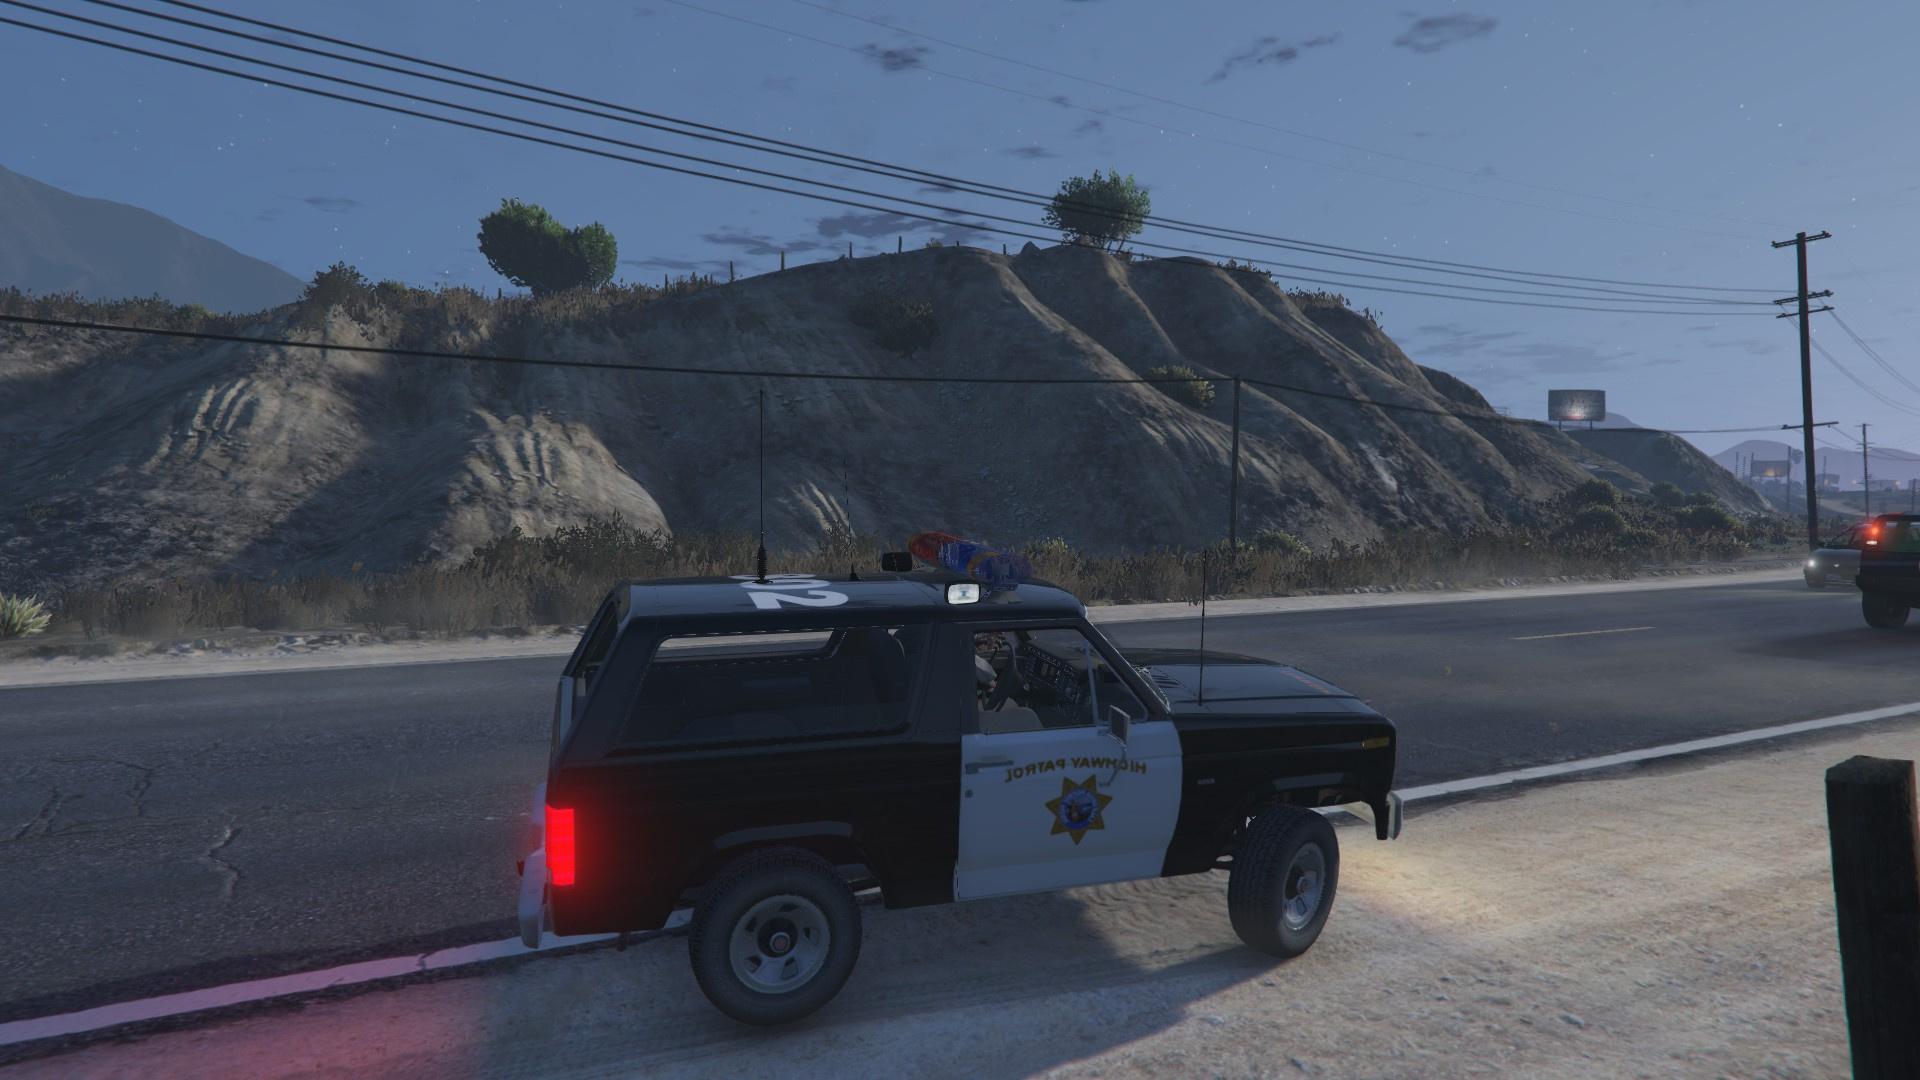 1980 Ford Bronco California Highway Patrol Gauges 9e9750 20161030155132 1